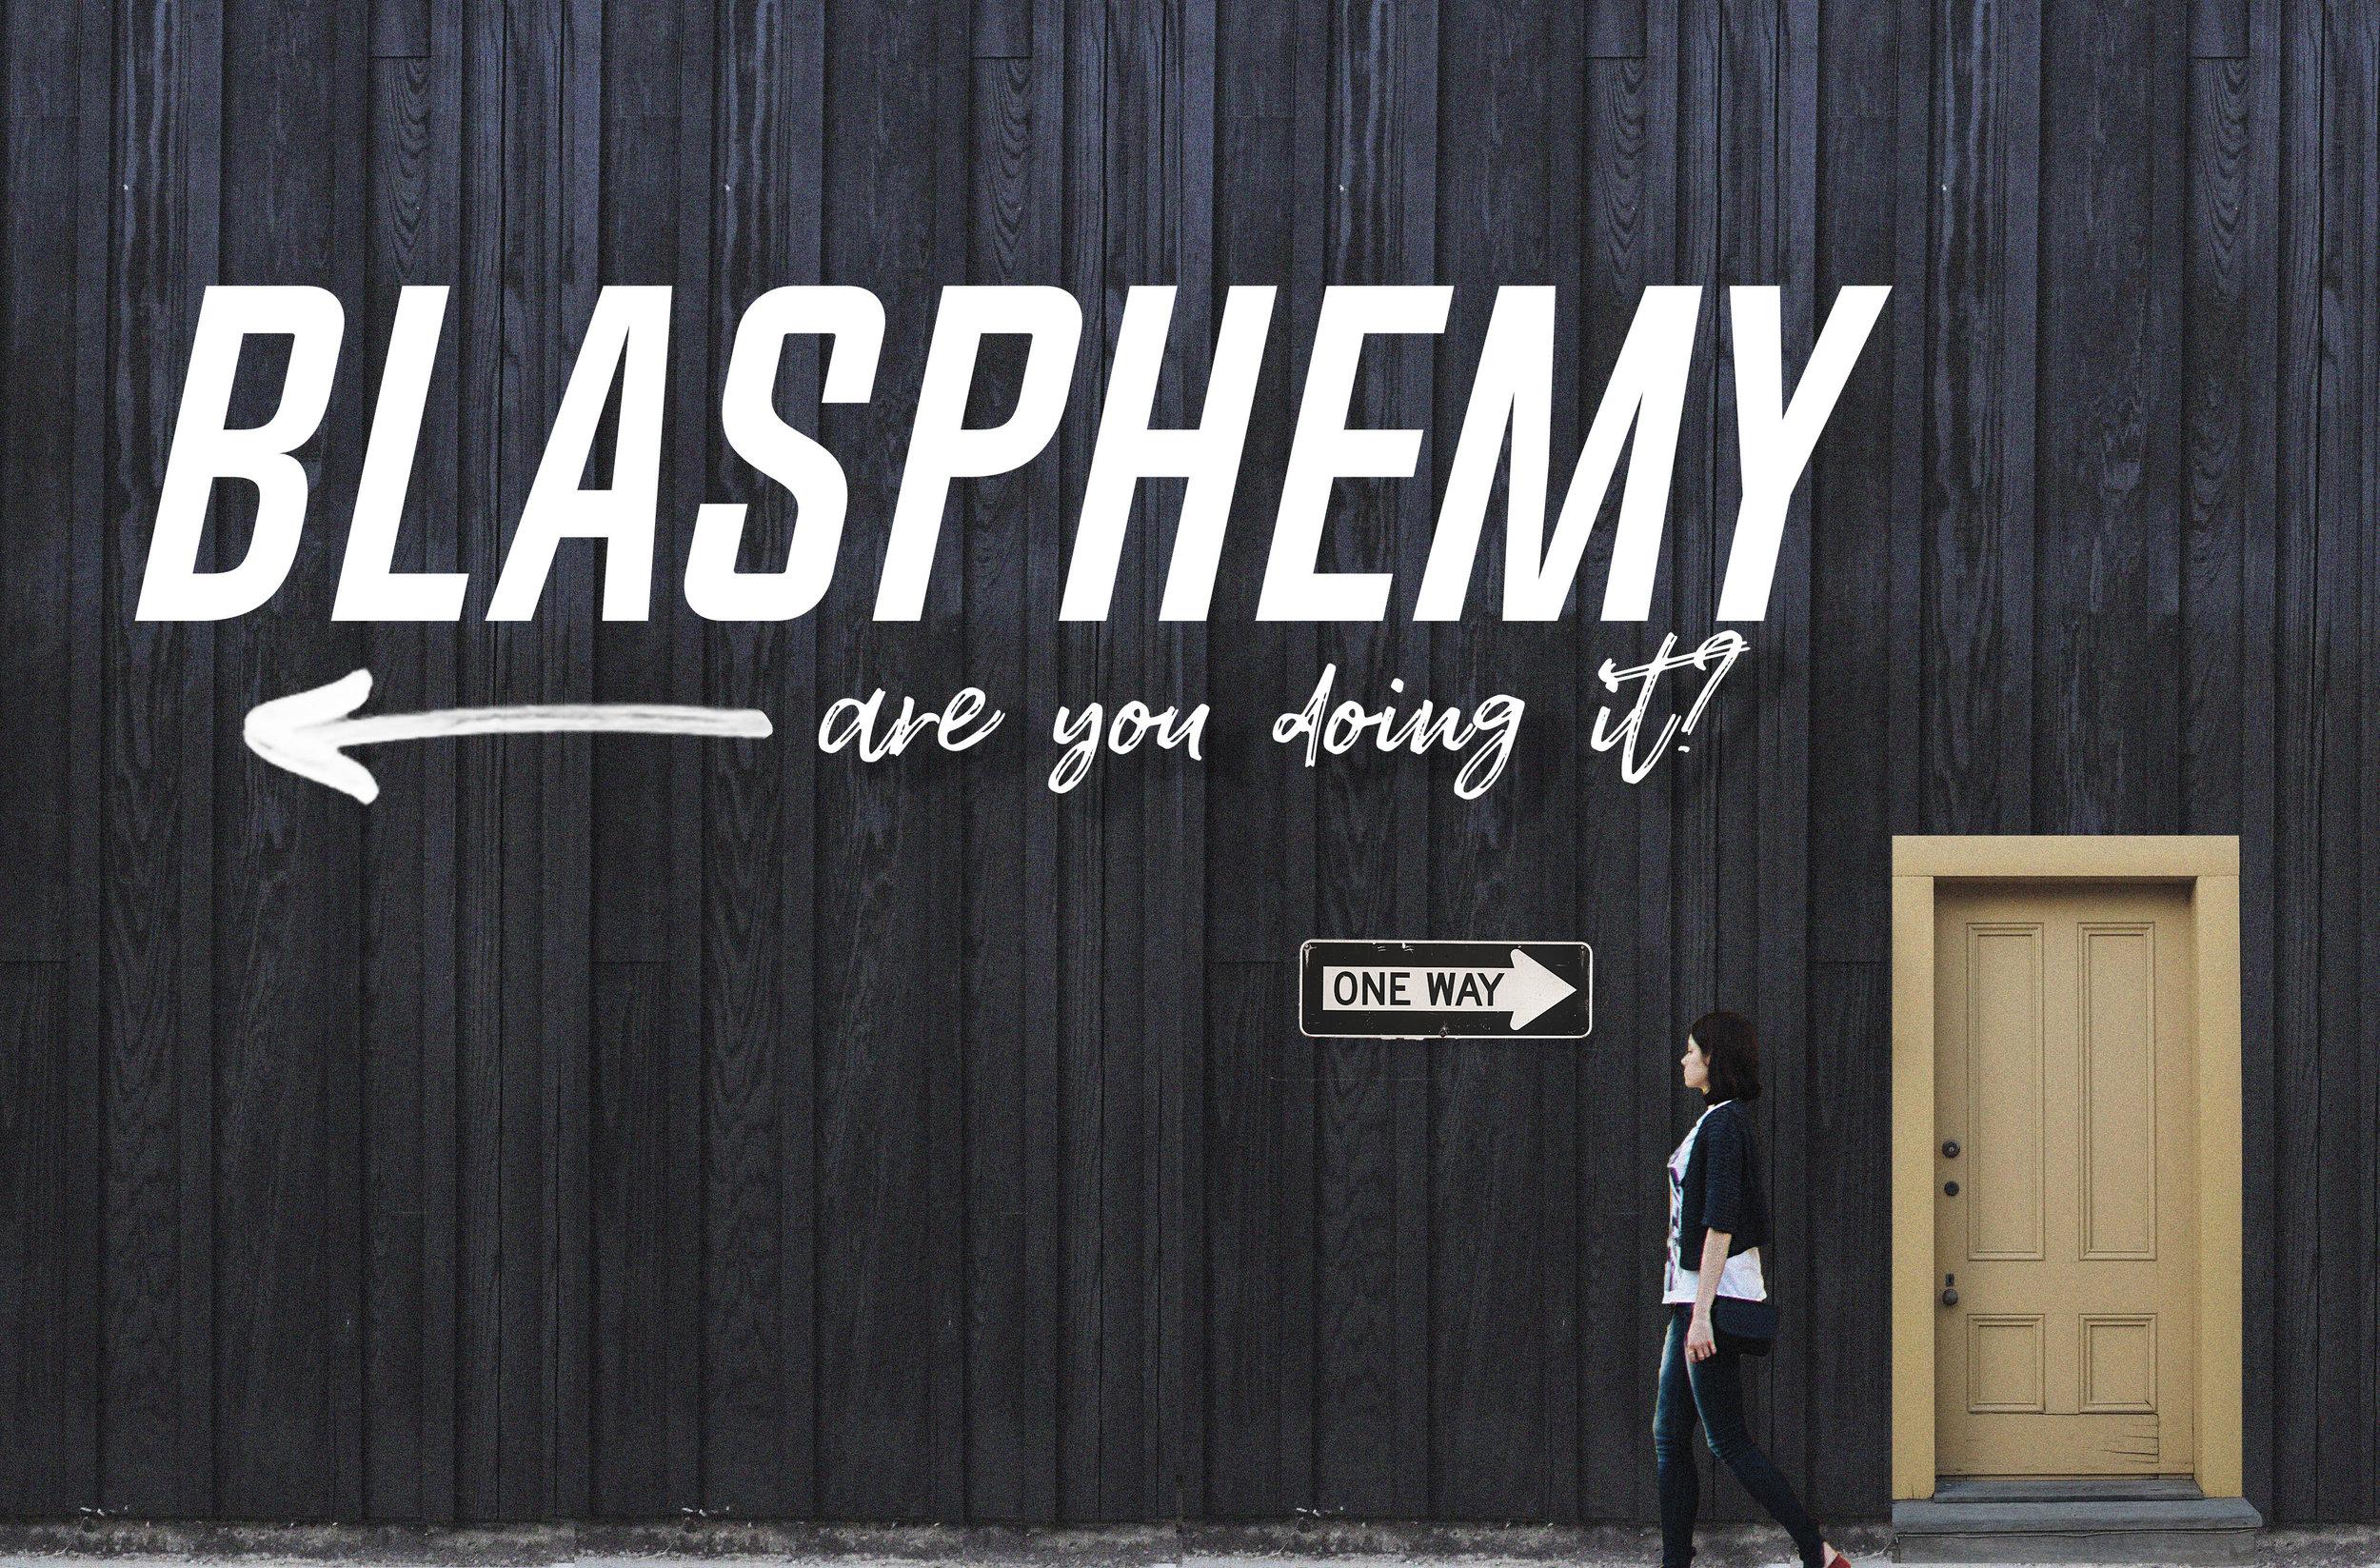 blasphemy-graphic.jpg